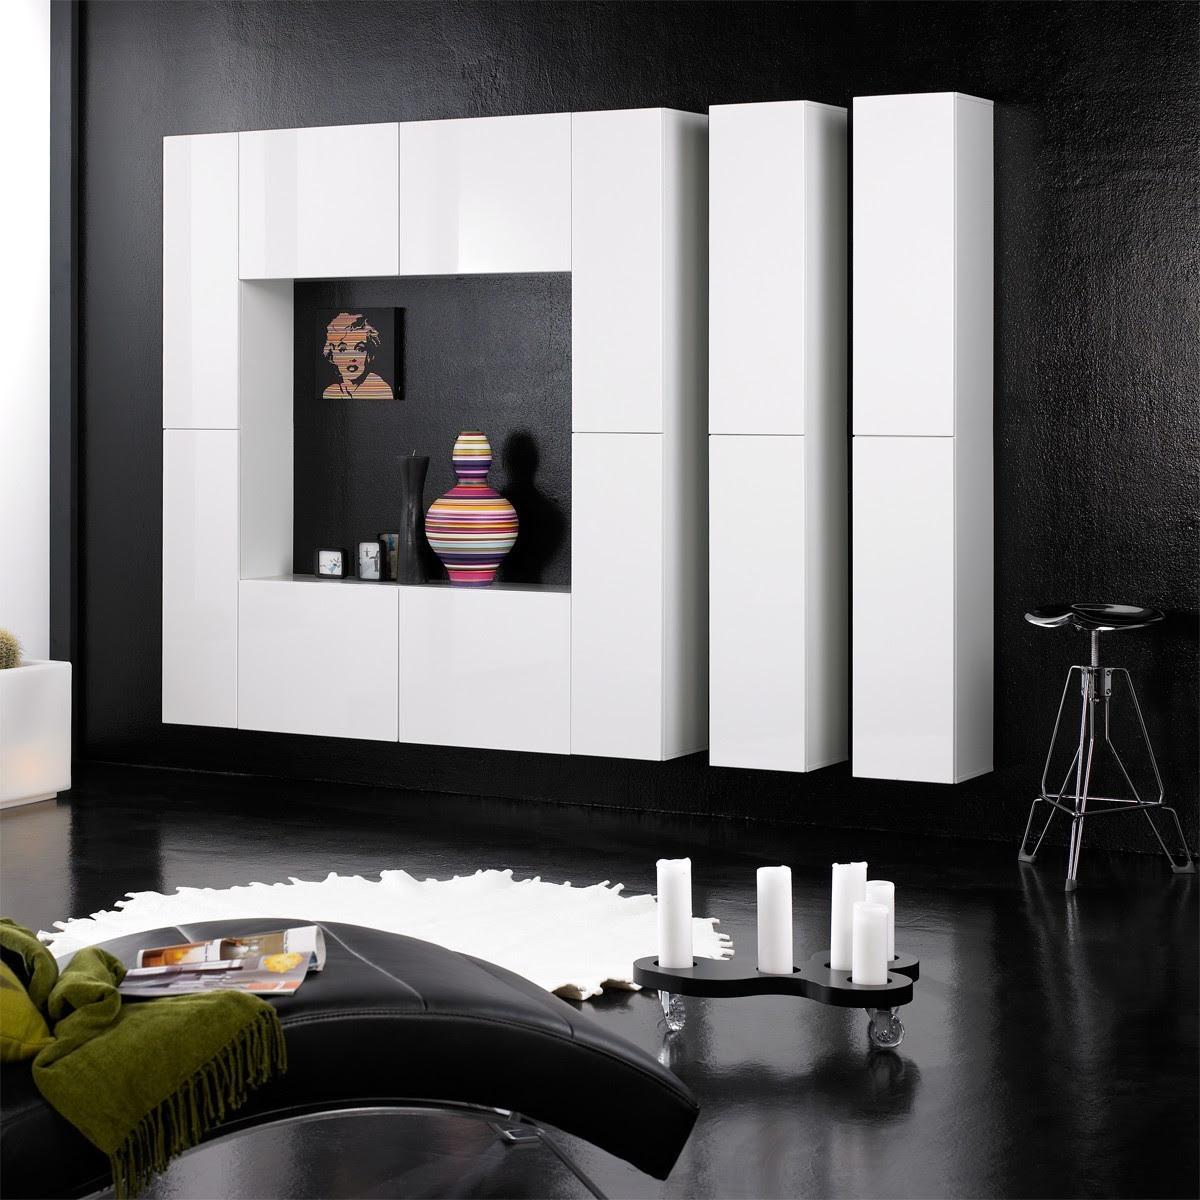 Design Wohnwand Schrankwand Anbauwand -Monaco- Weiß Hochglanz modern ...